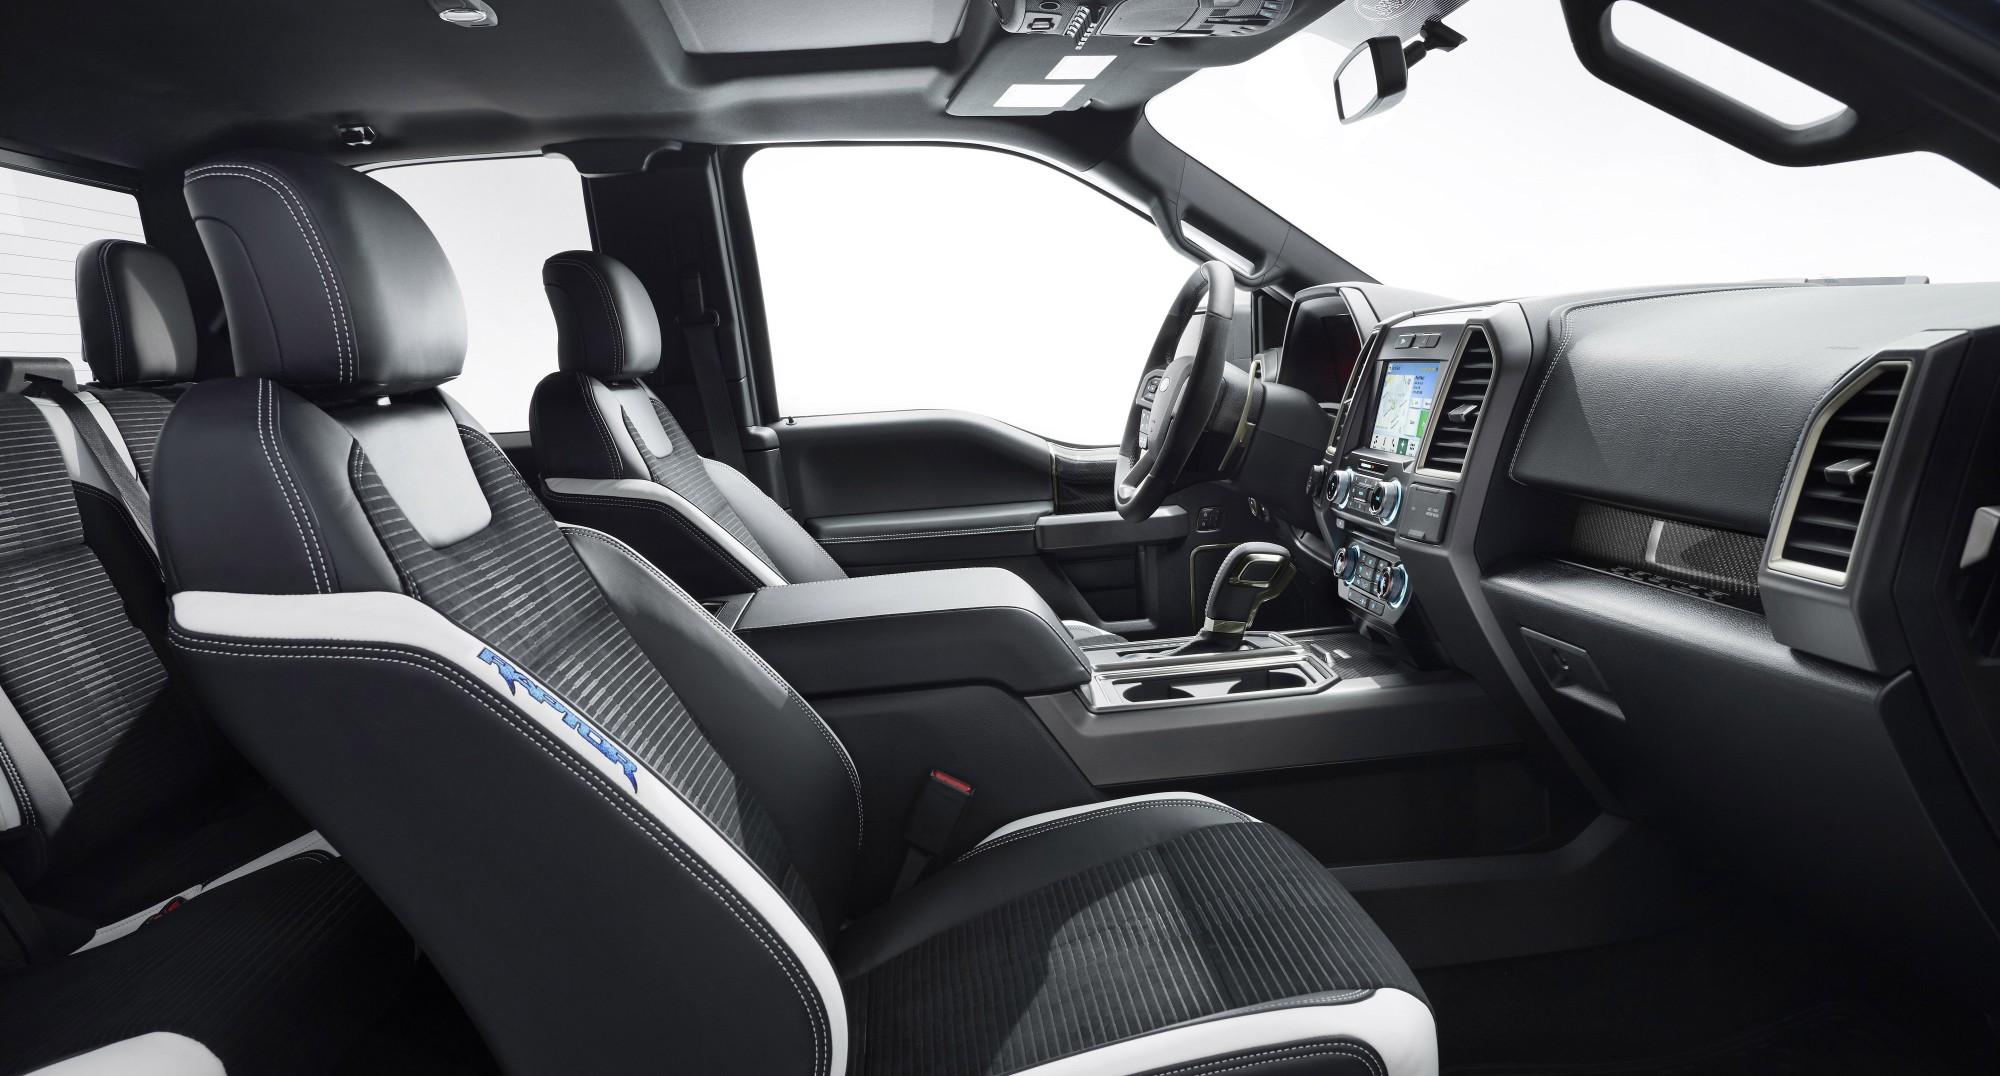 Image: Ford Motor Company